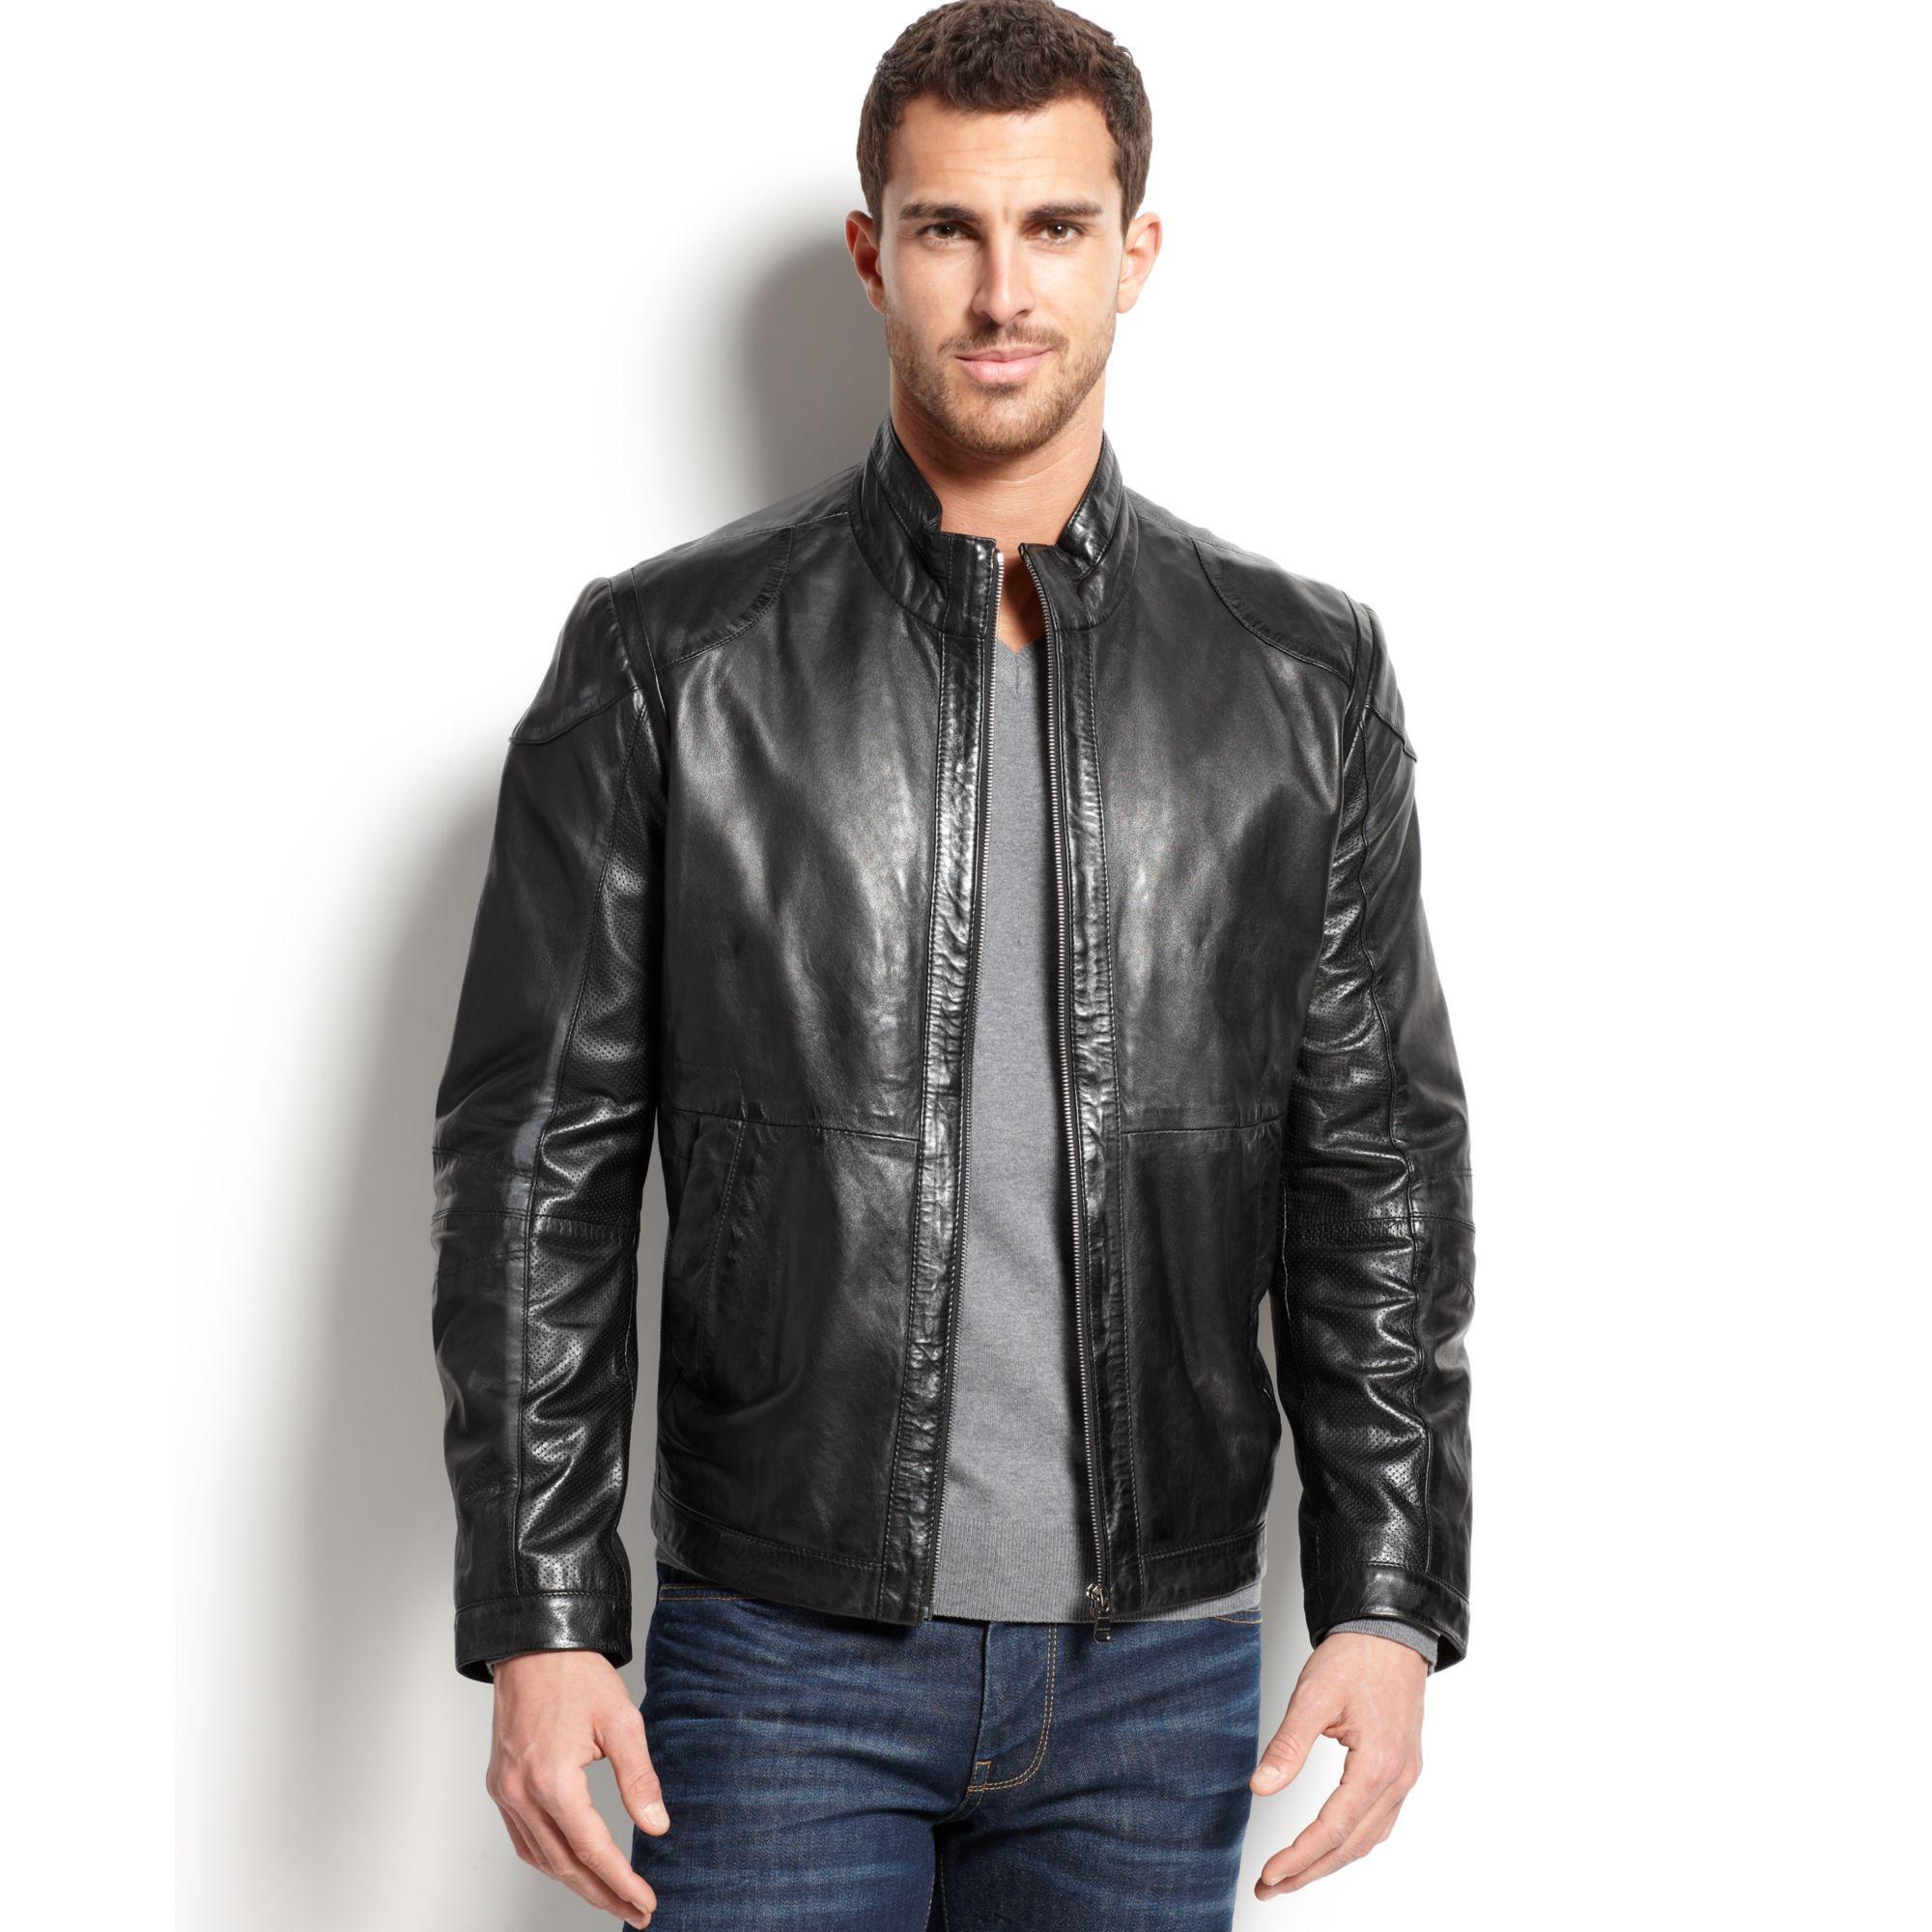 Leather jacket yahoo answers - Clint Mauro